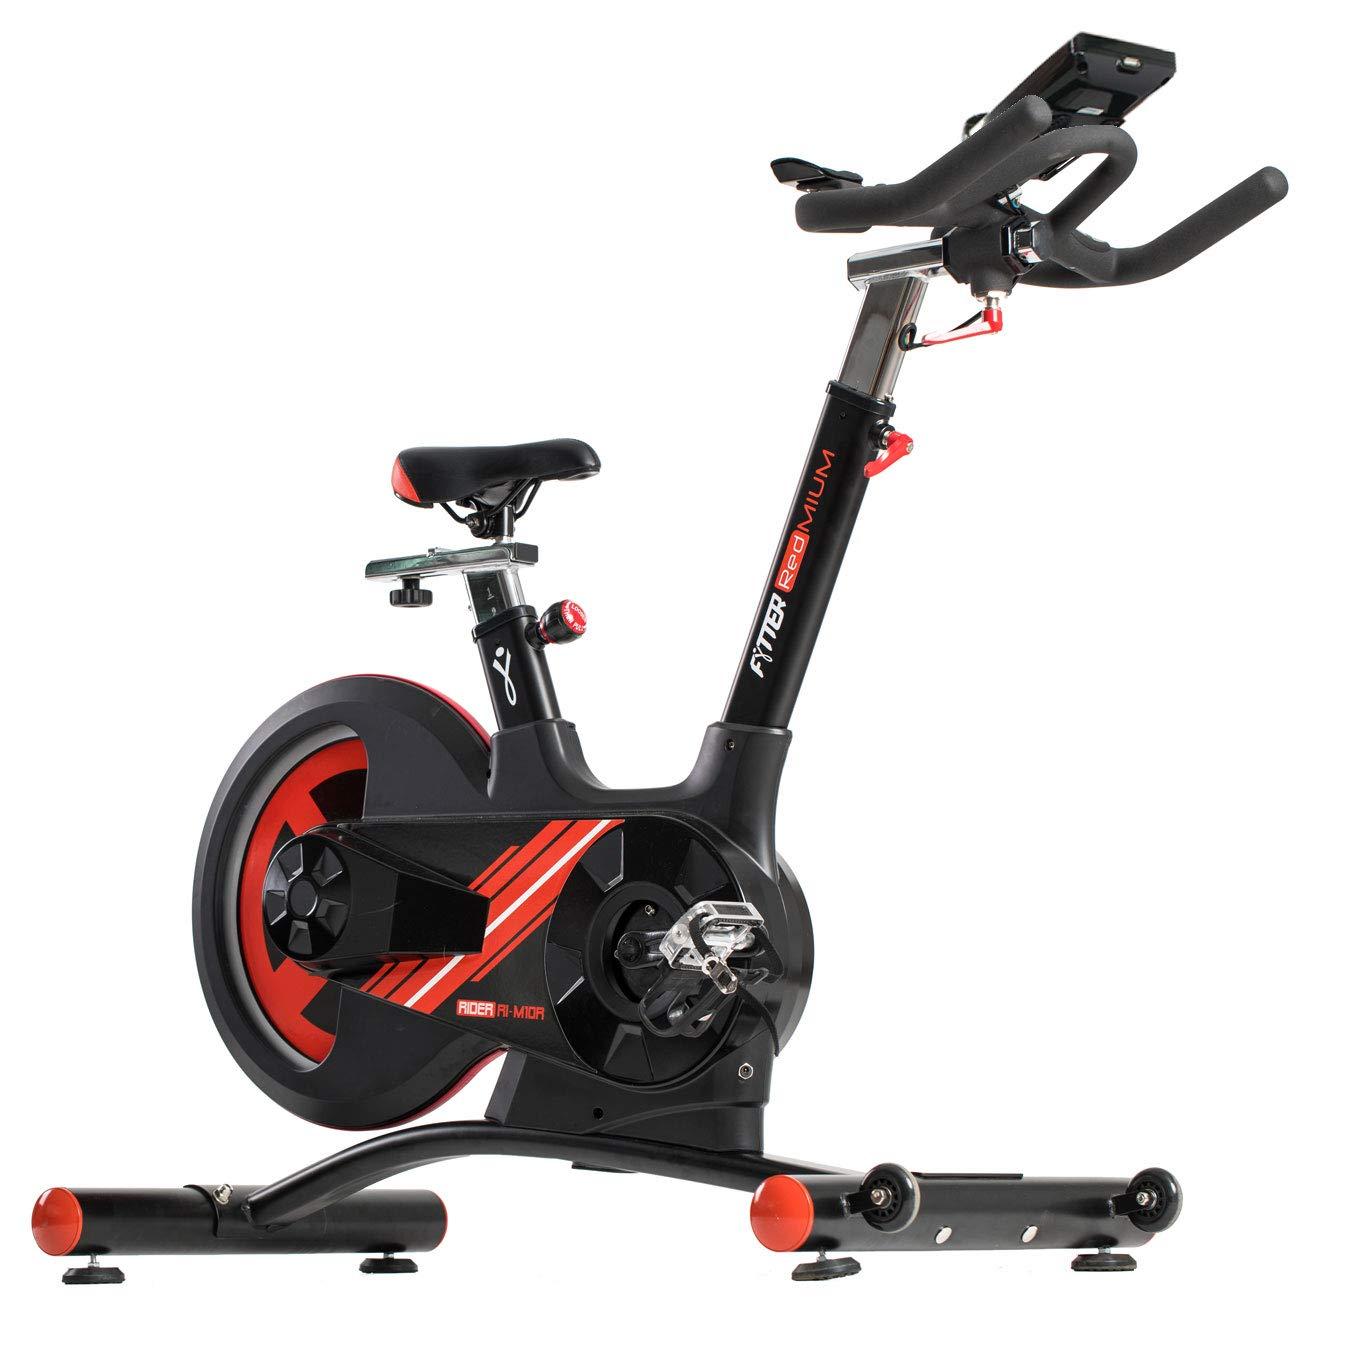 FYTTER - Bicicleta De Spinning Rim-10R: Amazon.es: Deportes y aire ...